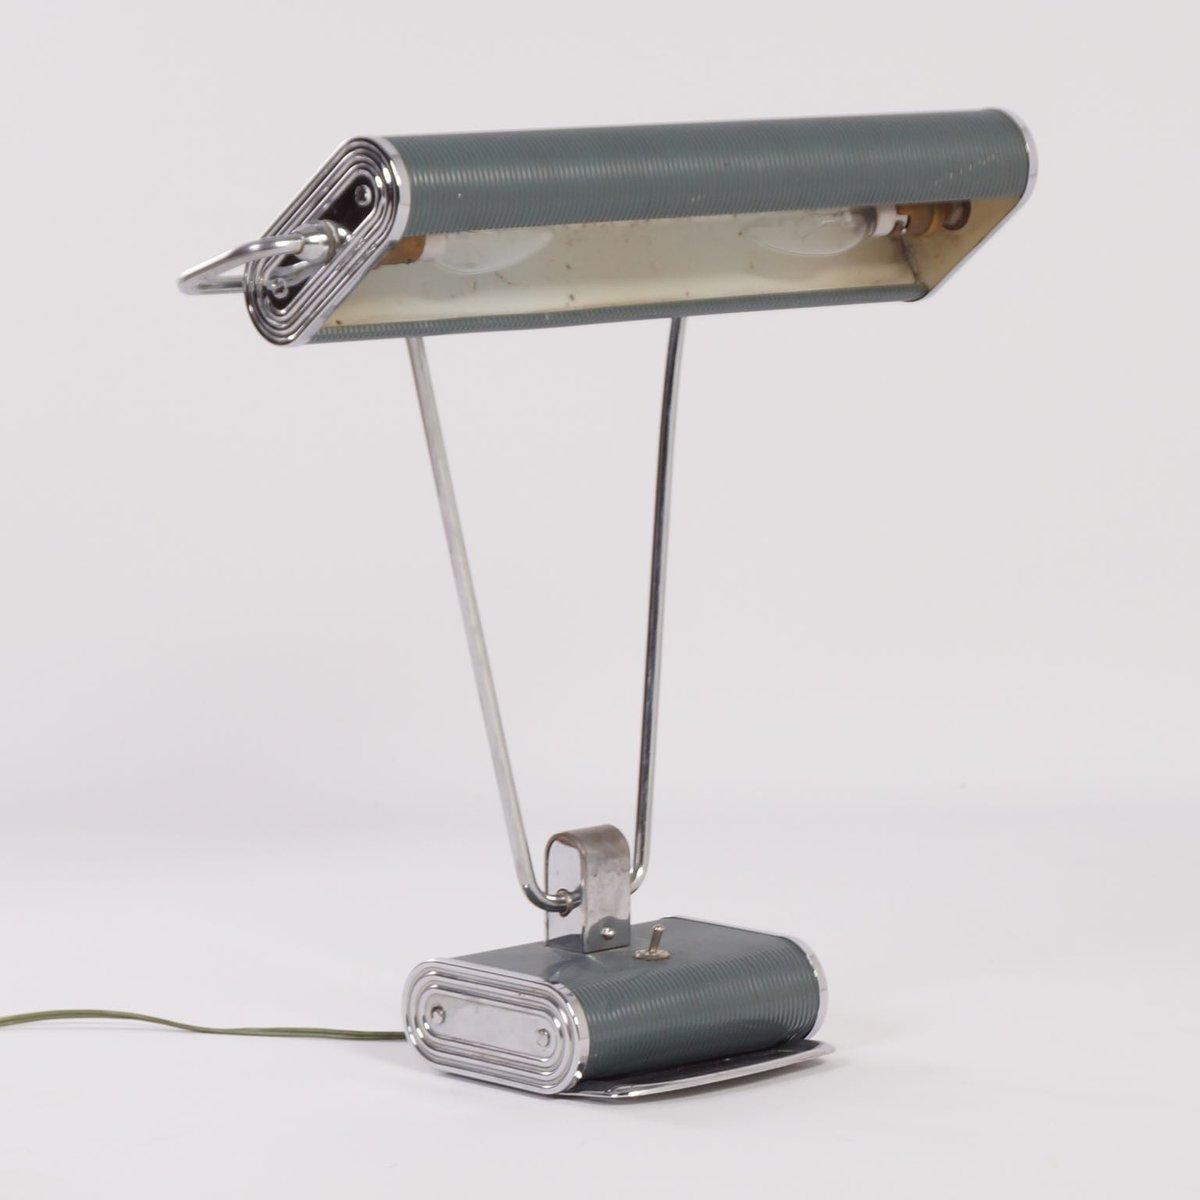 art deco desk lamp by eileen gray for jumo 1930s for sale. Black Bedroom Furniture Sets. Home Design Ideas